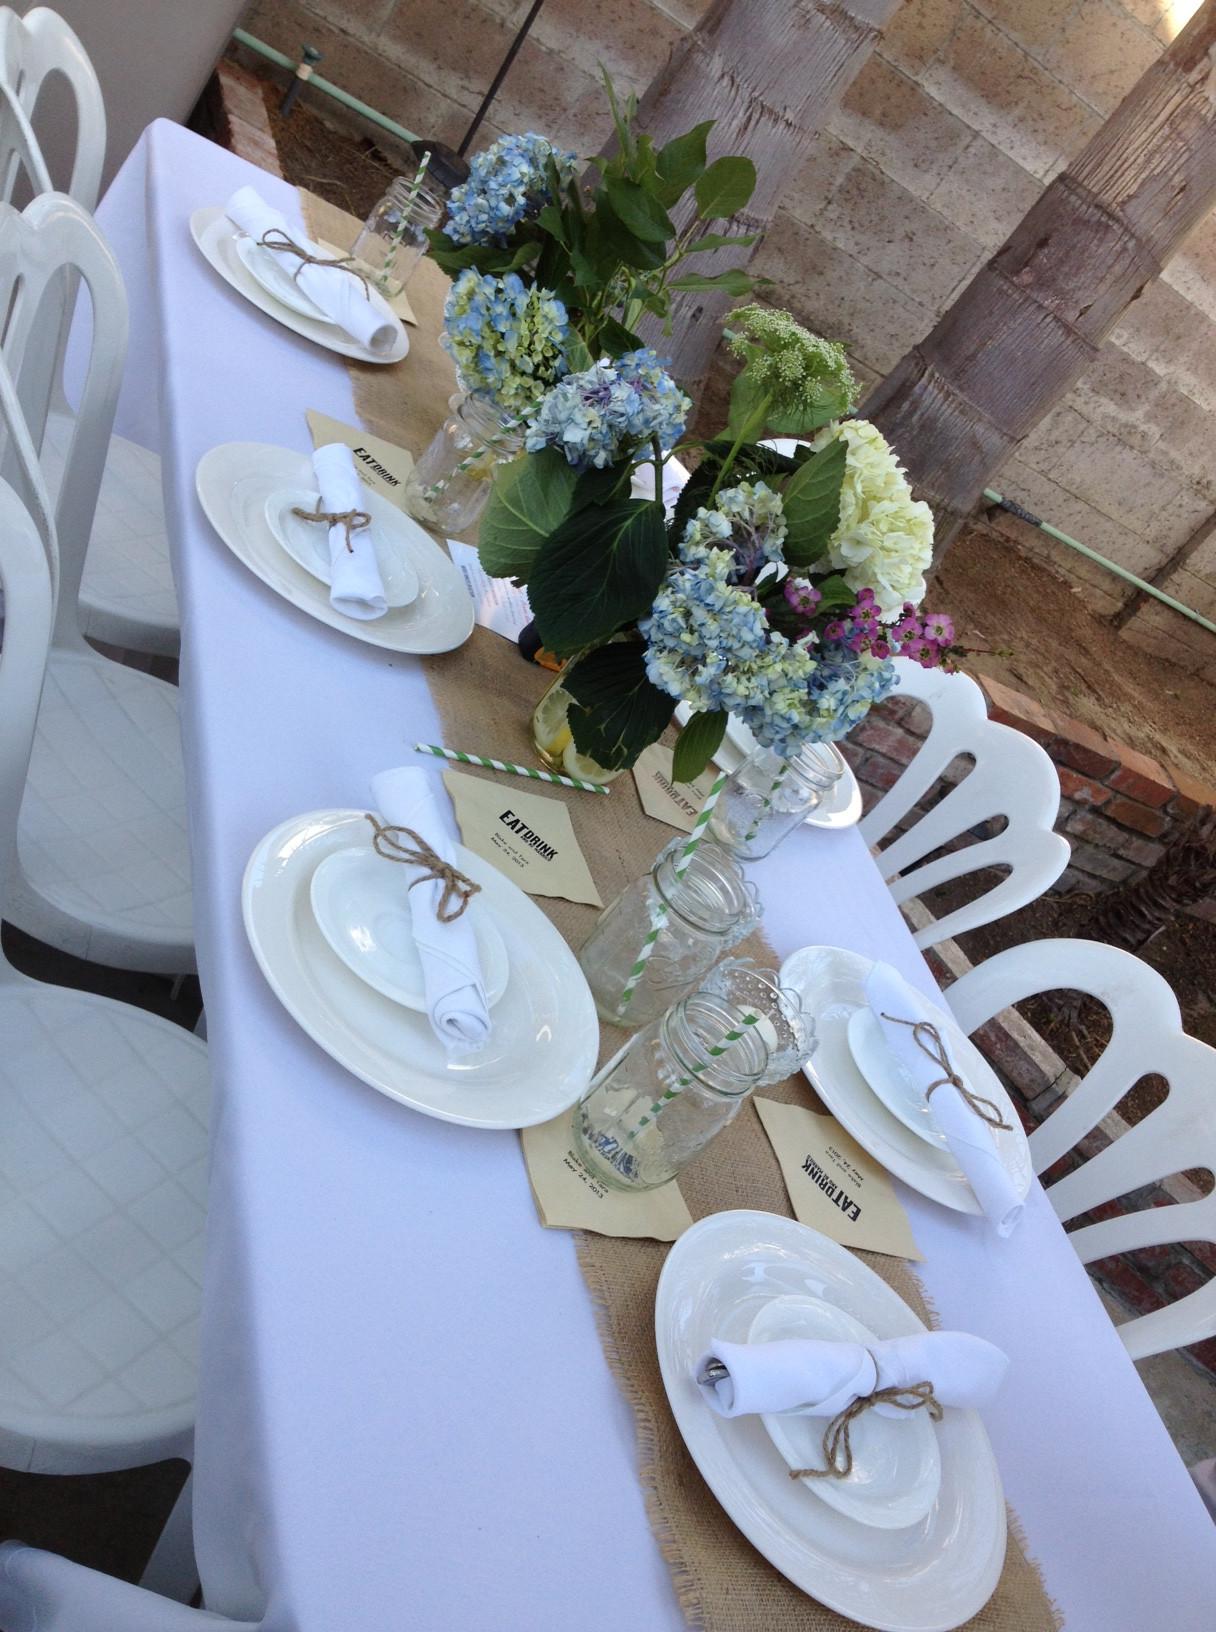 Best ideas about DIY Wedding Reception . Save or Pin Backyard DIY Wedding Reception Now.